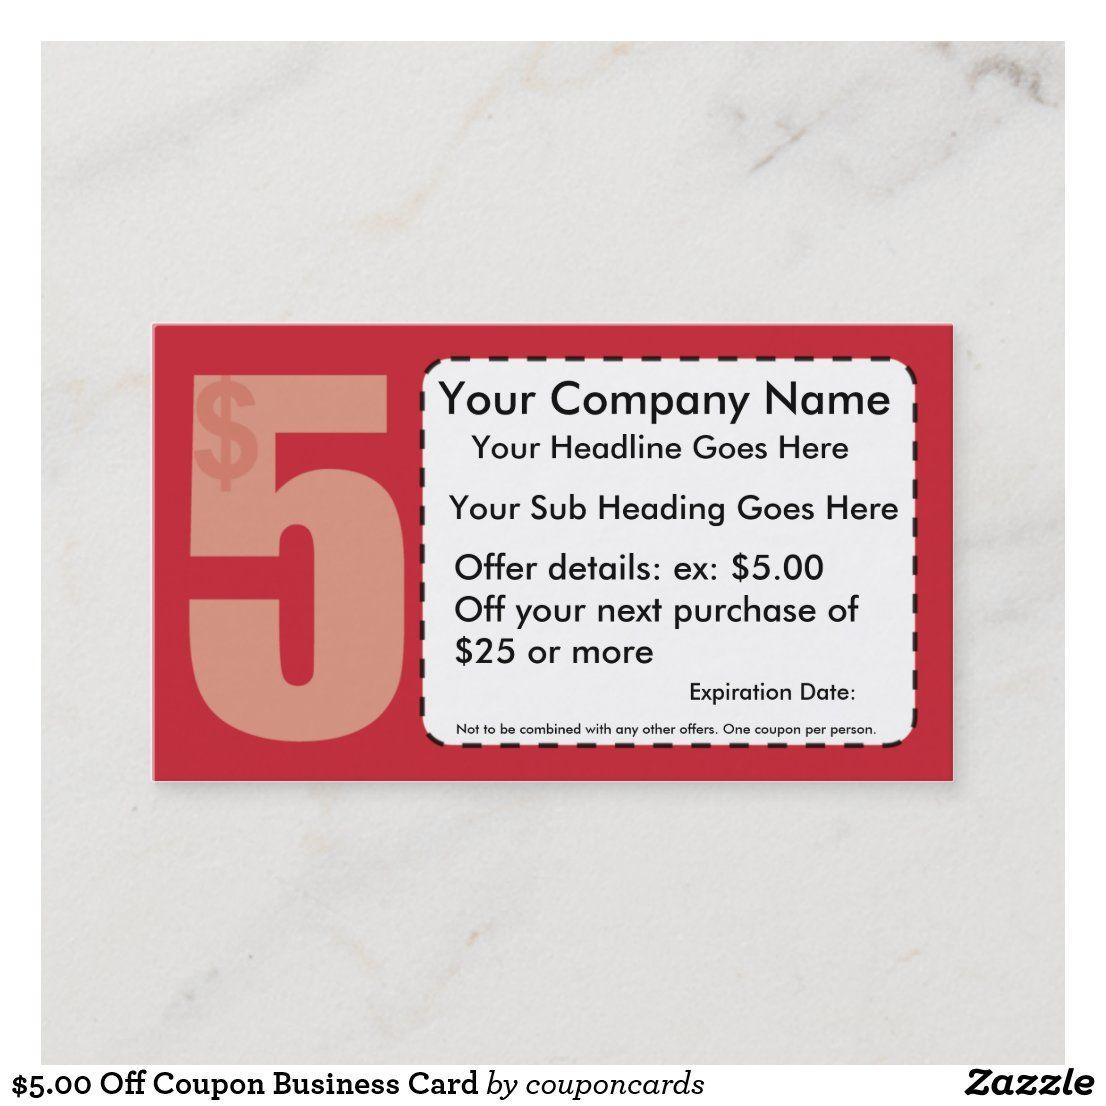 5 00 Off Coupon Business Card Zazzle Com Discount Card Standard Business Card Size Business Cards